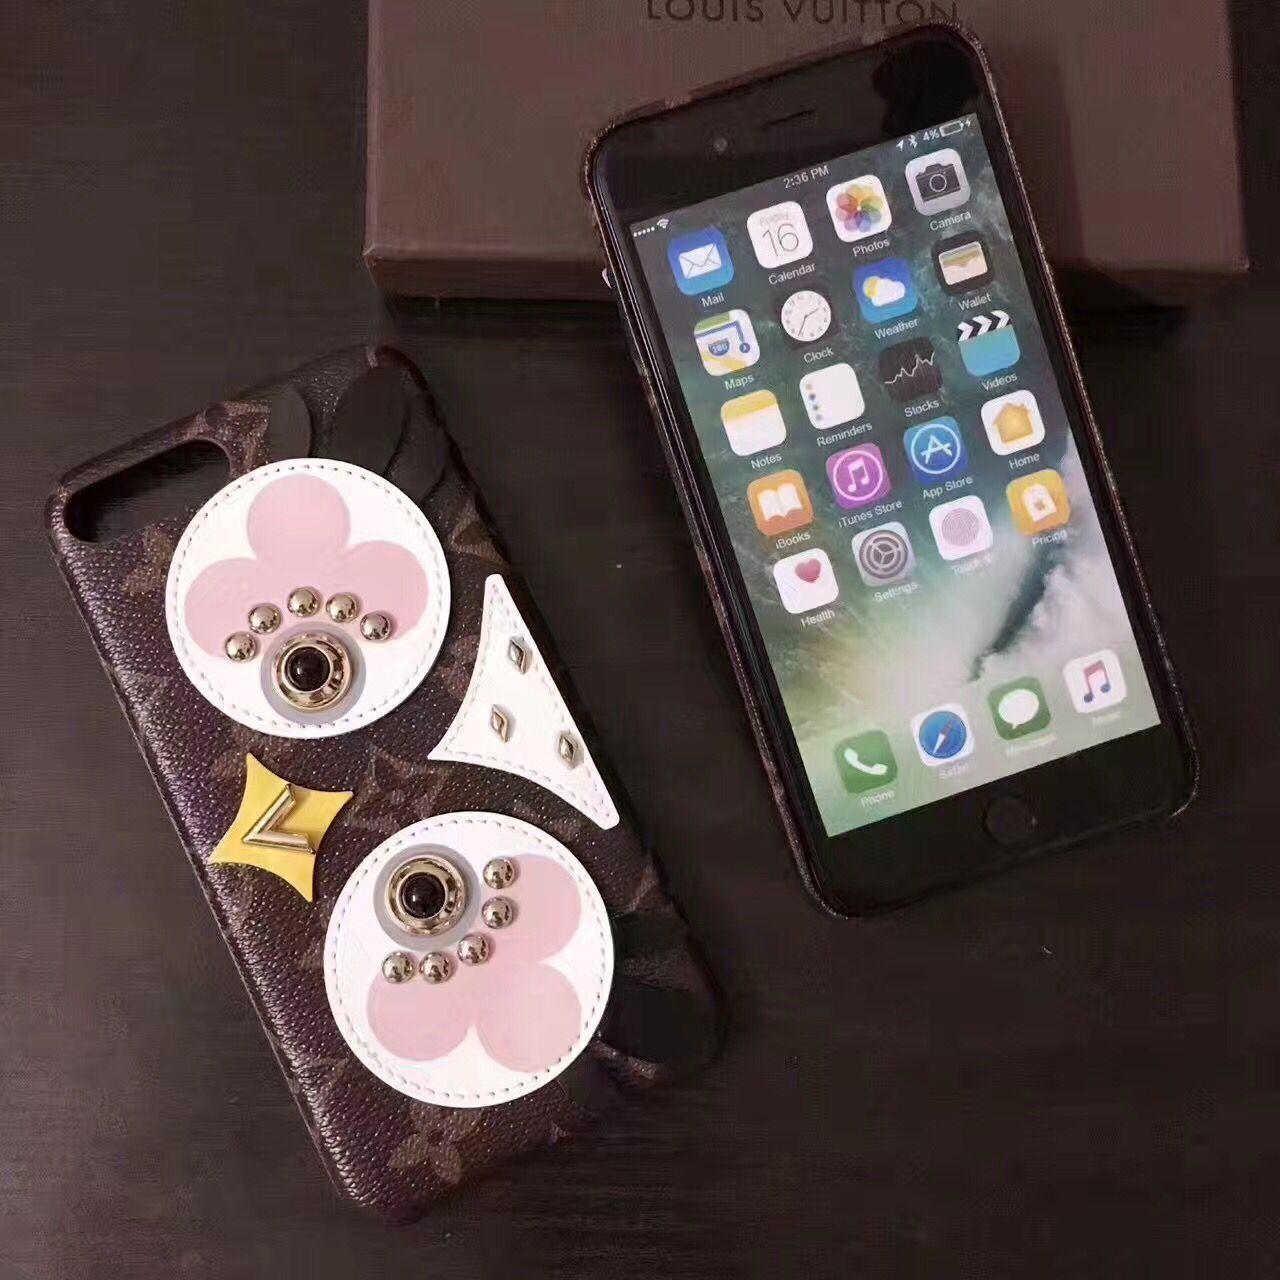 schöne iphone hüllen iphone hülle bedrucken Louis Vuitton iphone 8 Plus hüllen neues iphone von apple flip ca8 Plus iphone 8 Plus hülle für iphone 3 hülle iphone 8 Plus s kamera iphone 8 Plus handyschale mit foto